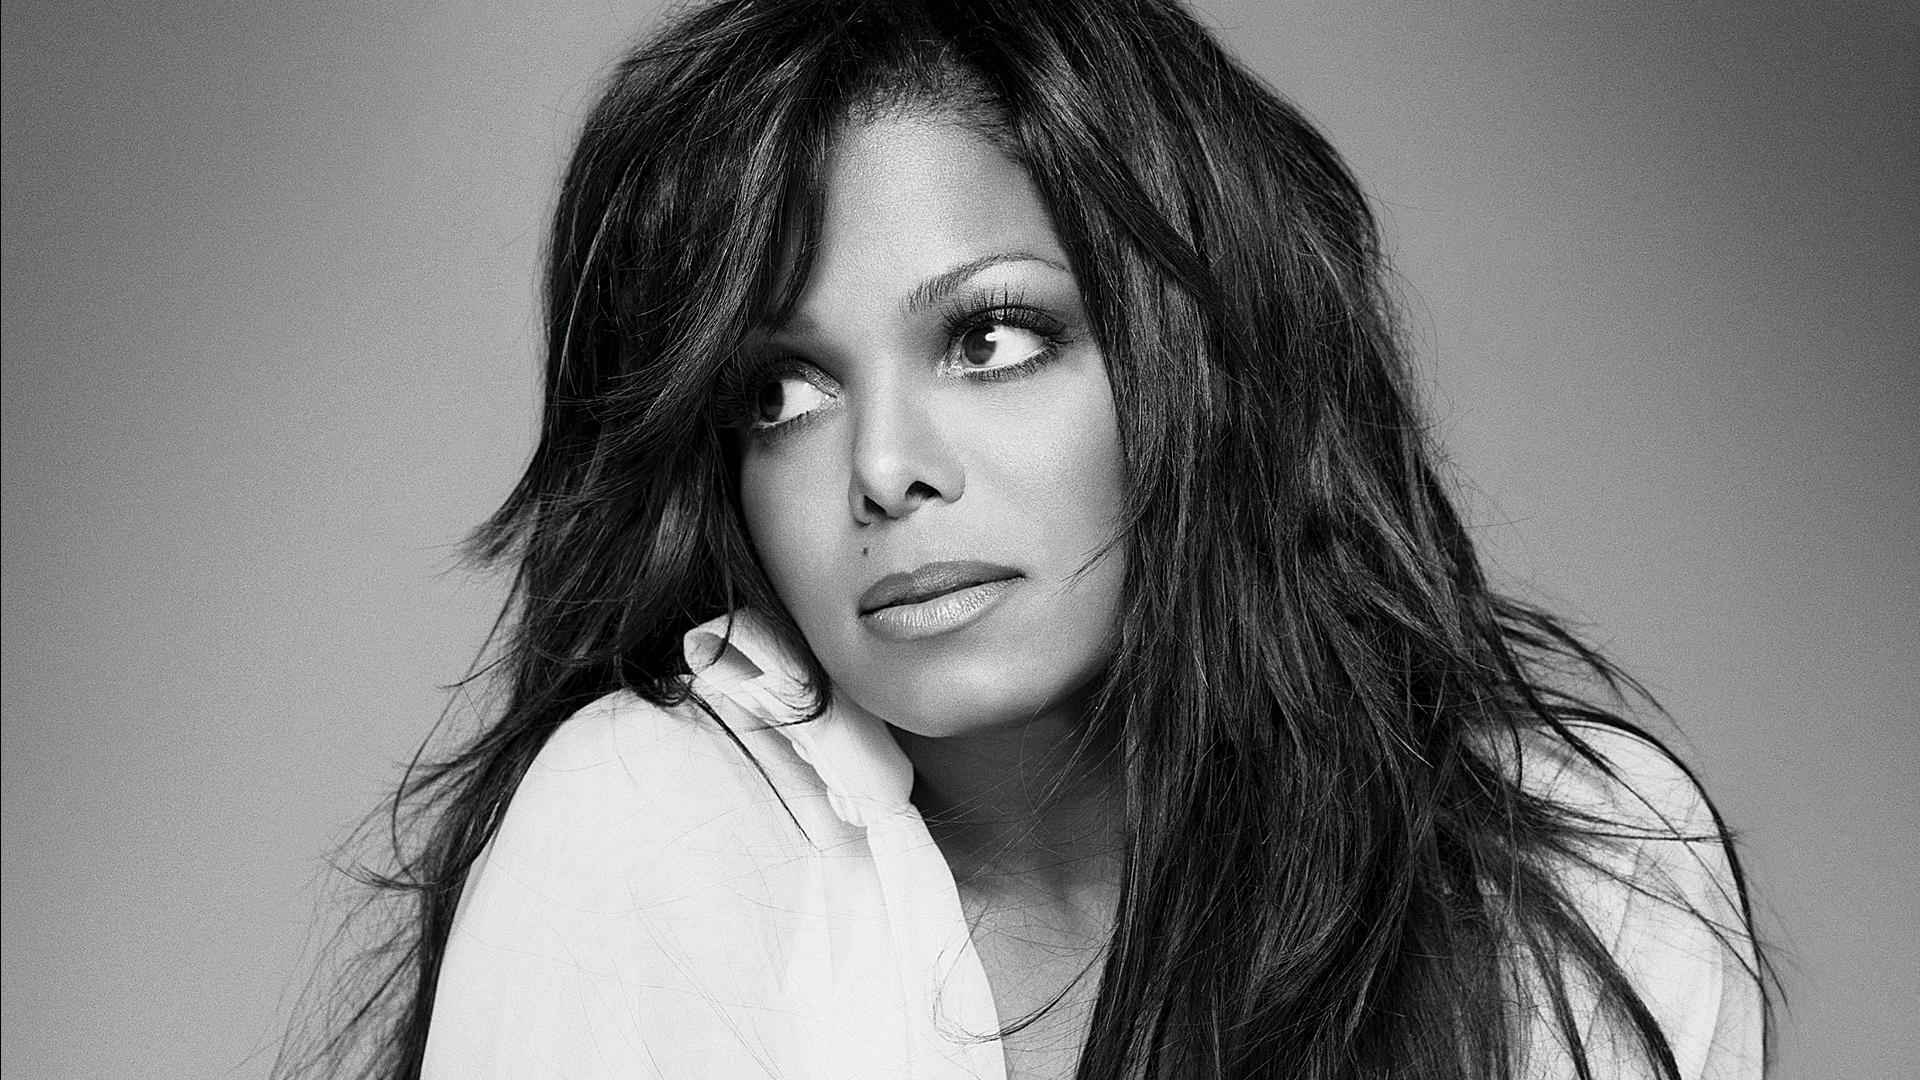 Janet-Jackson-Wallpapers-2